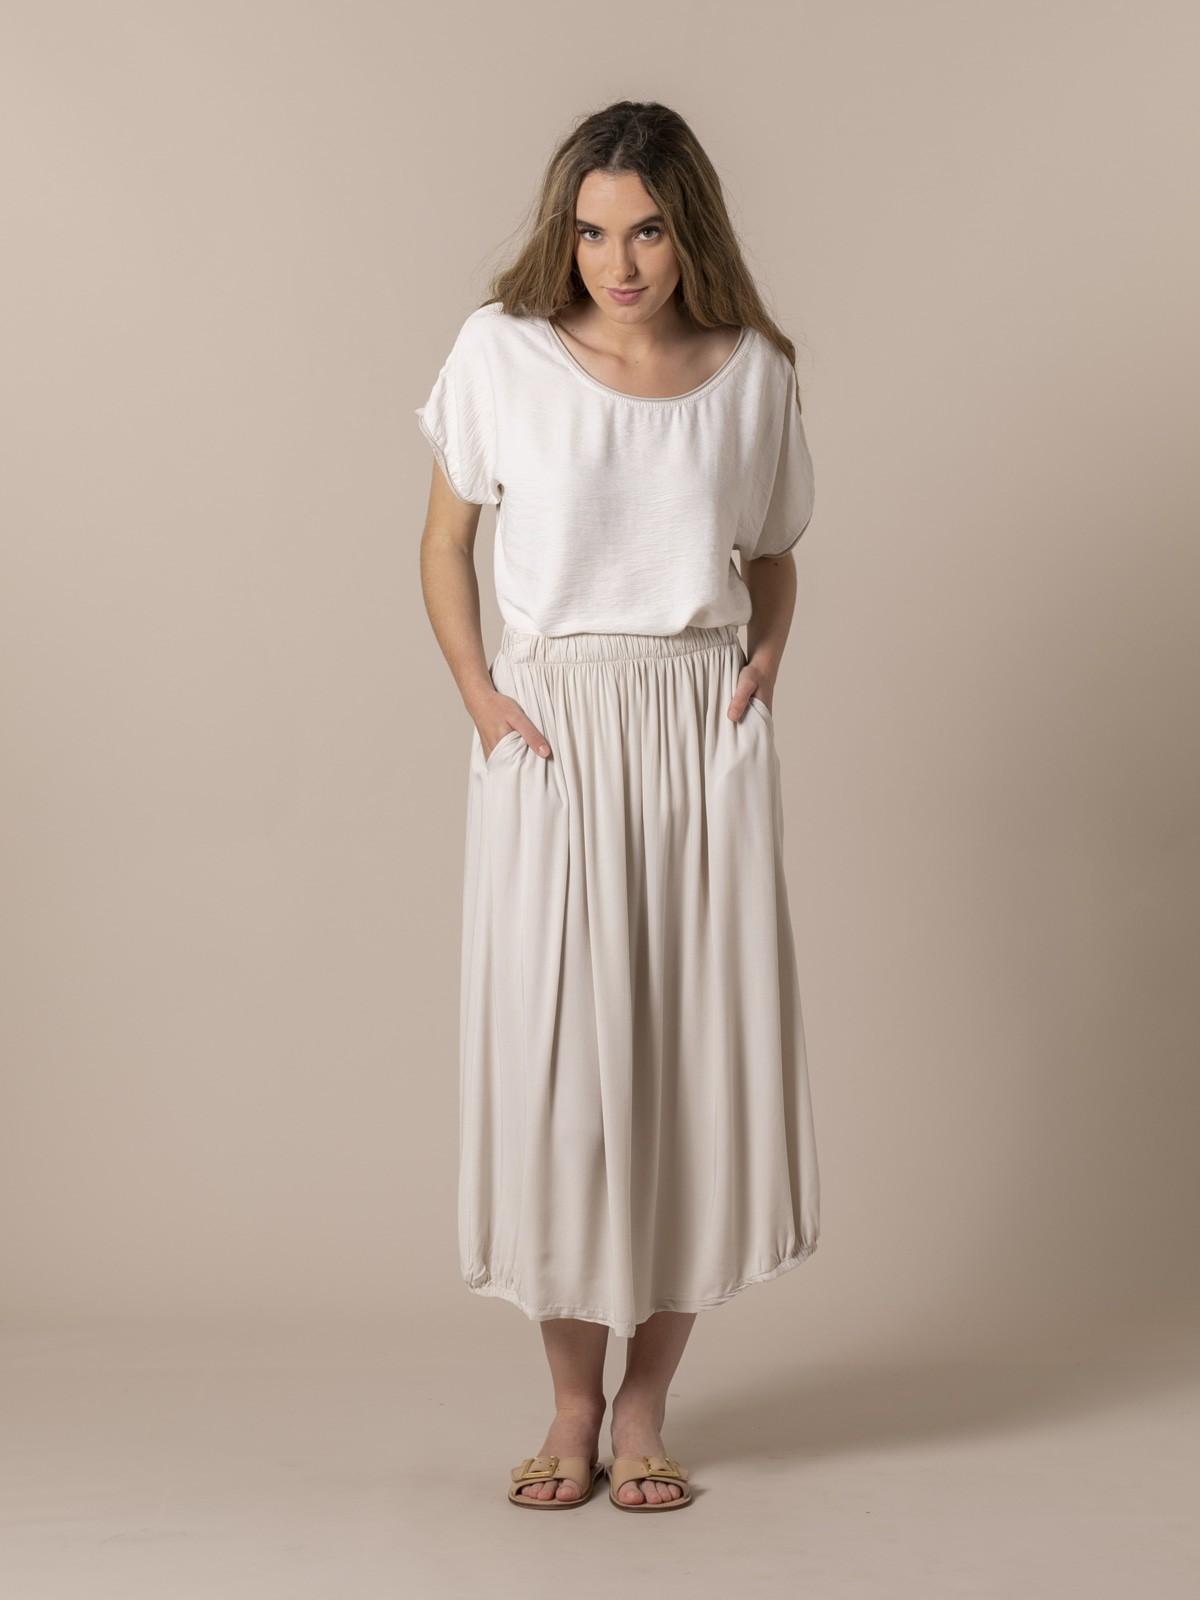 Falda fluida cintura elástica Beige